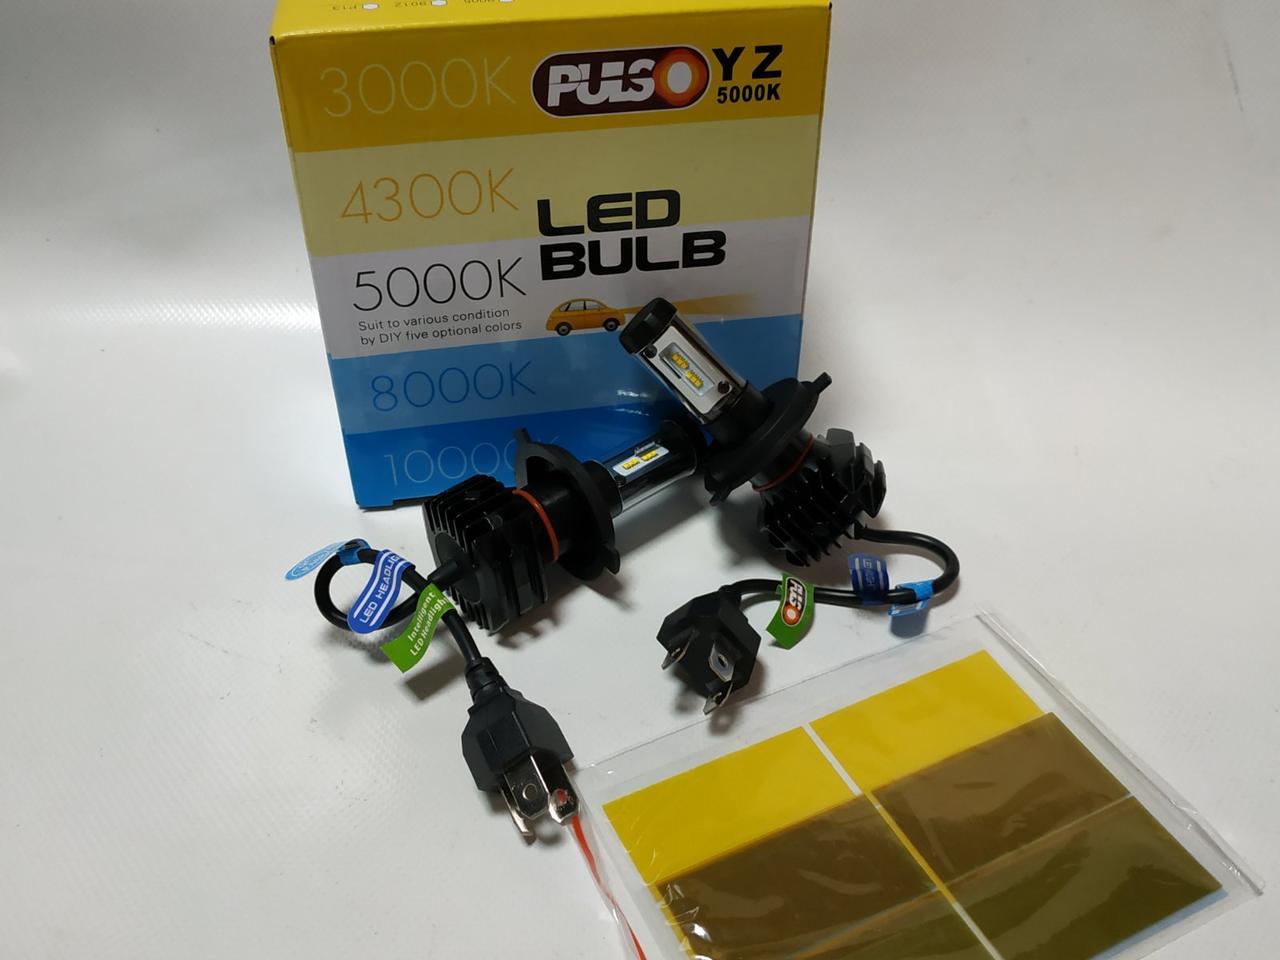 Светодиодные лампы H4 PULSO 7S/LED-chips ZES/9-32v25w/5000Lm/3000-6000-8000K